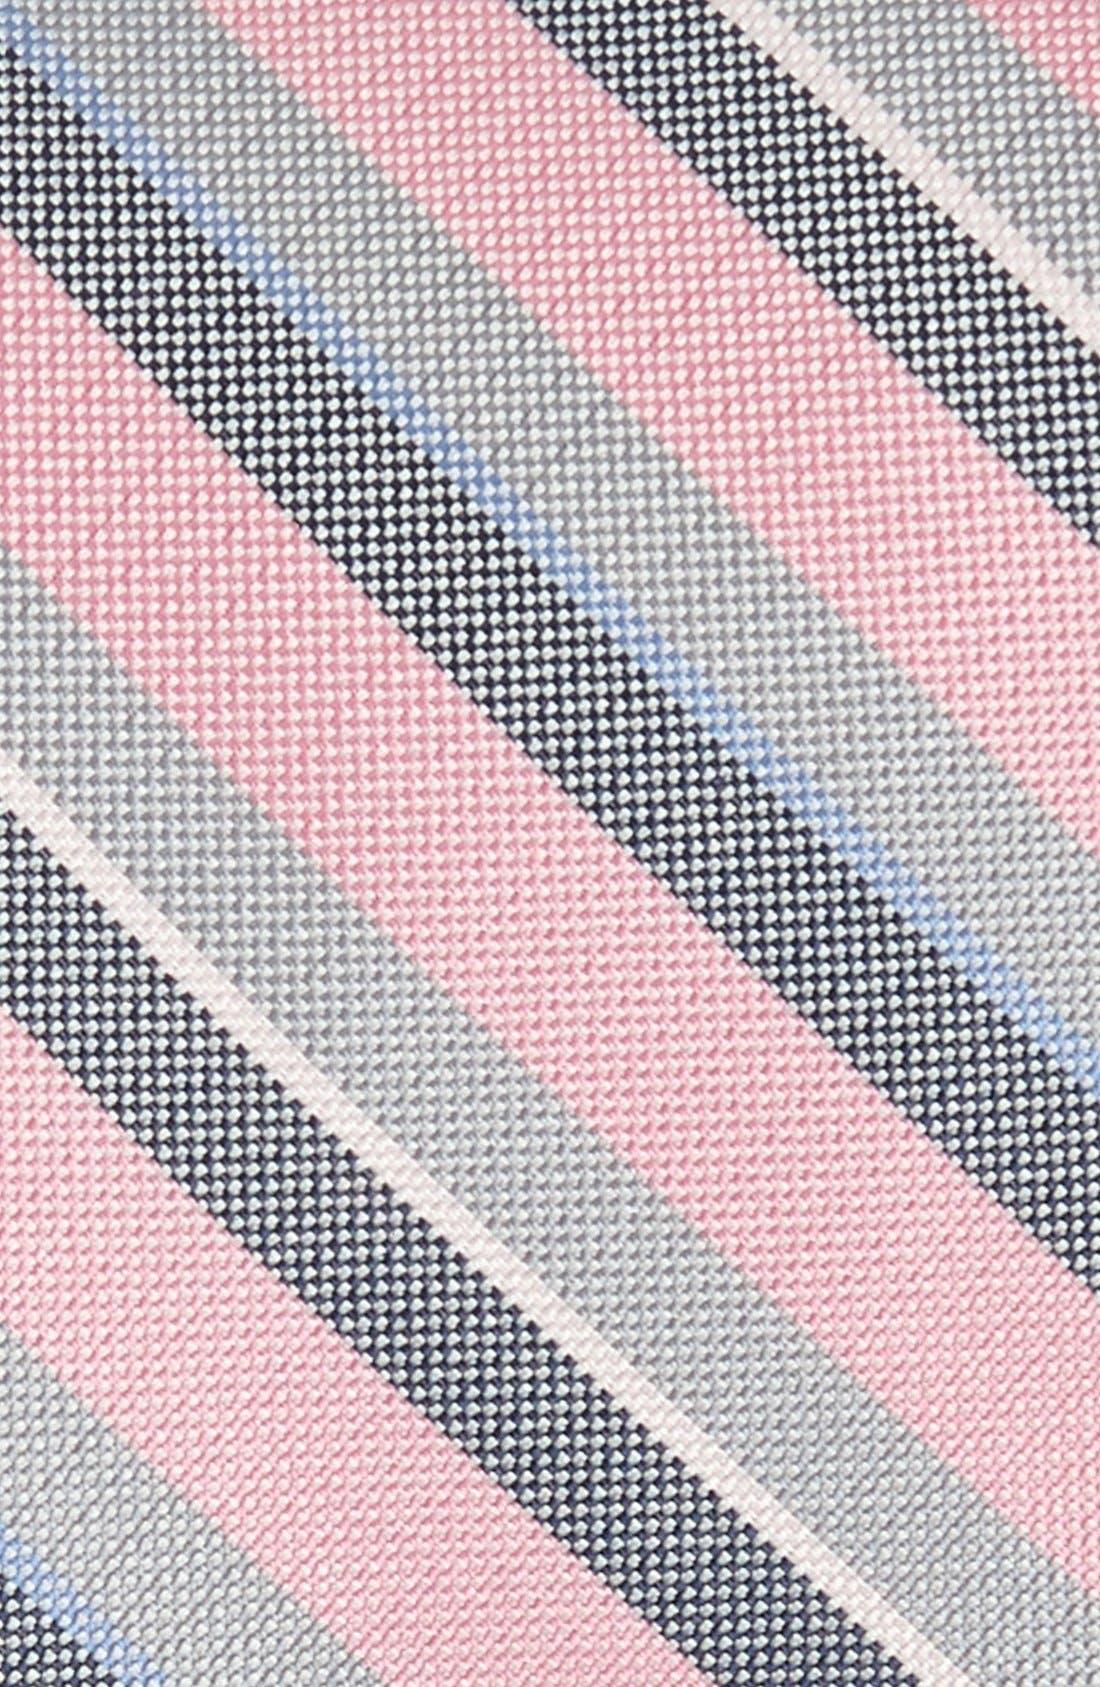 Alternate Image 2  - EDIT by The Tie Bar Stripe Silk Tie (Nordstrom Exclusive)